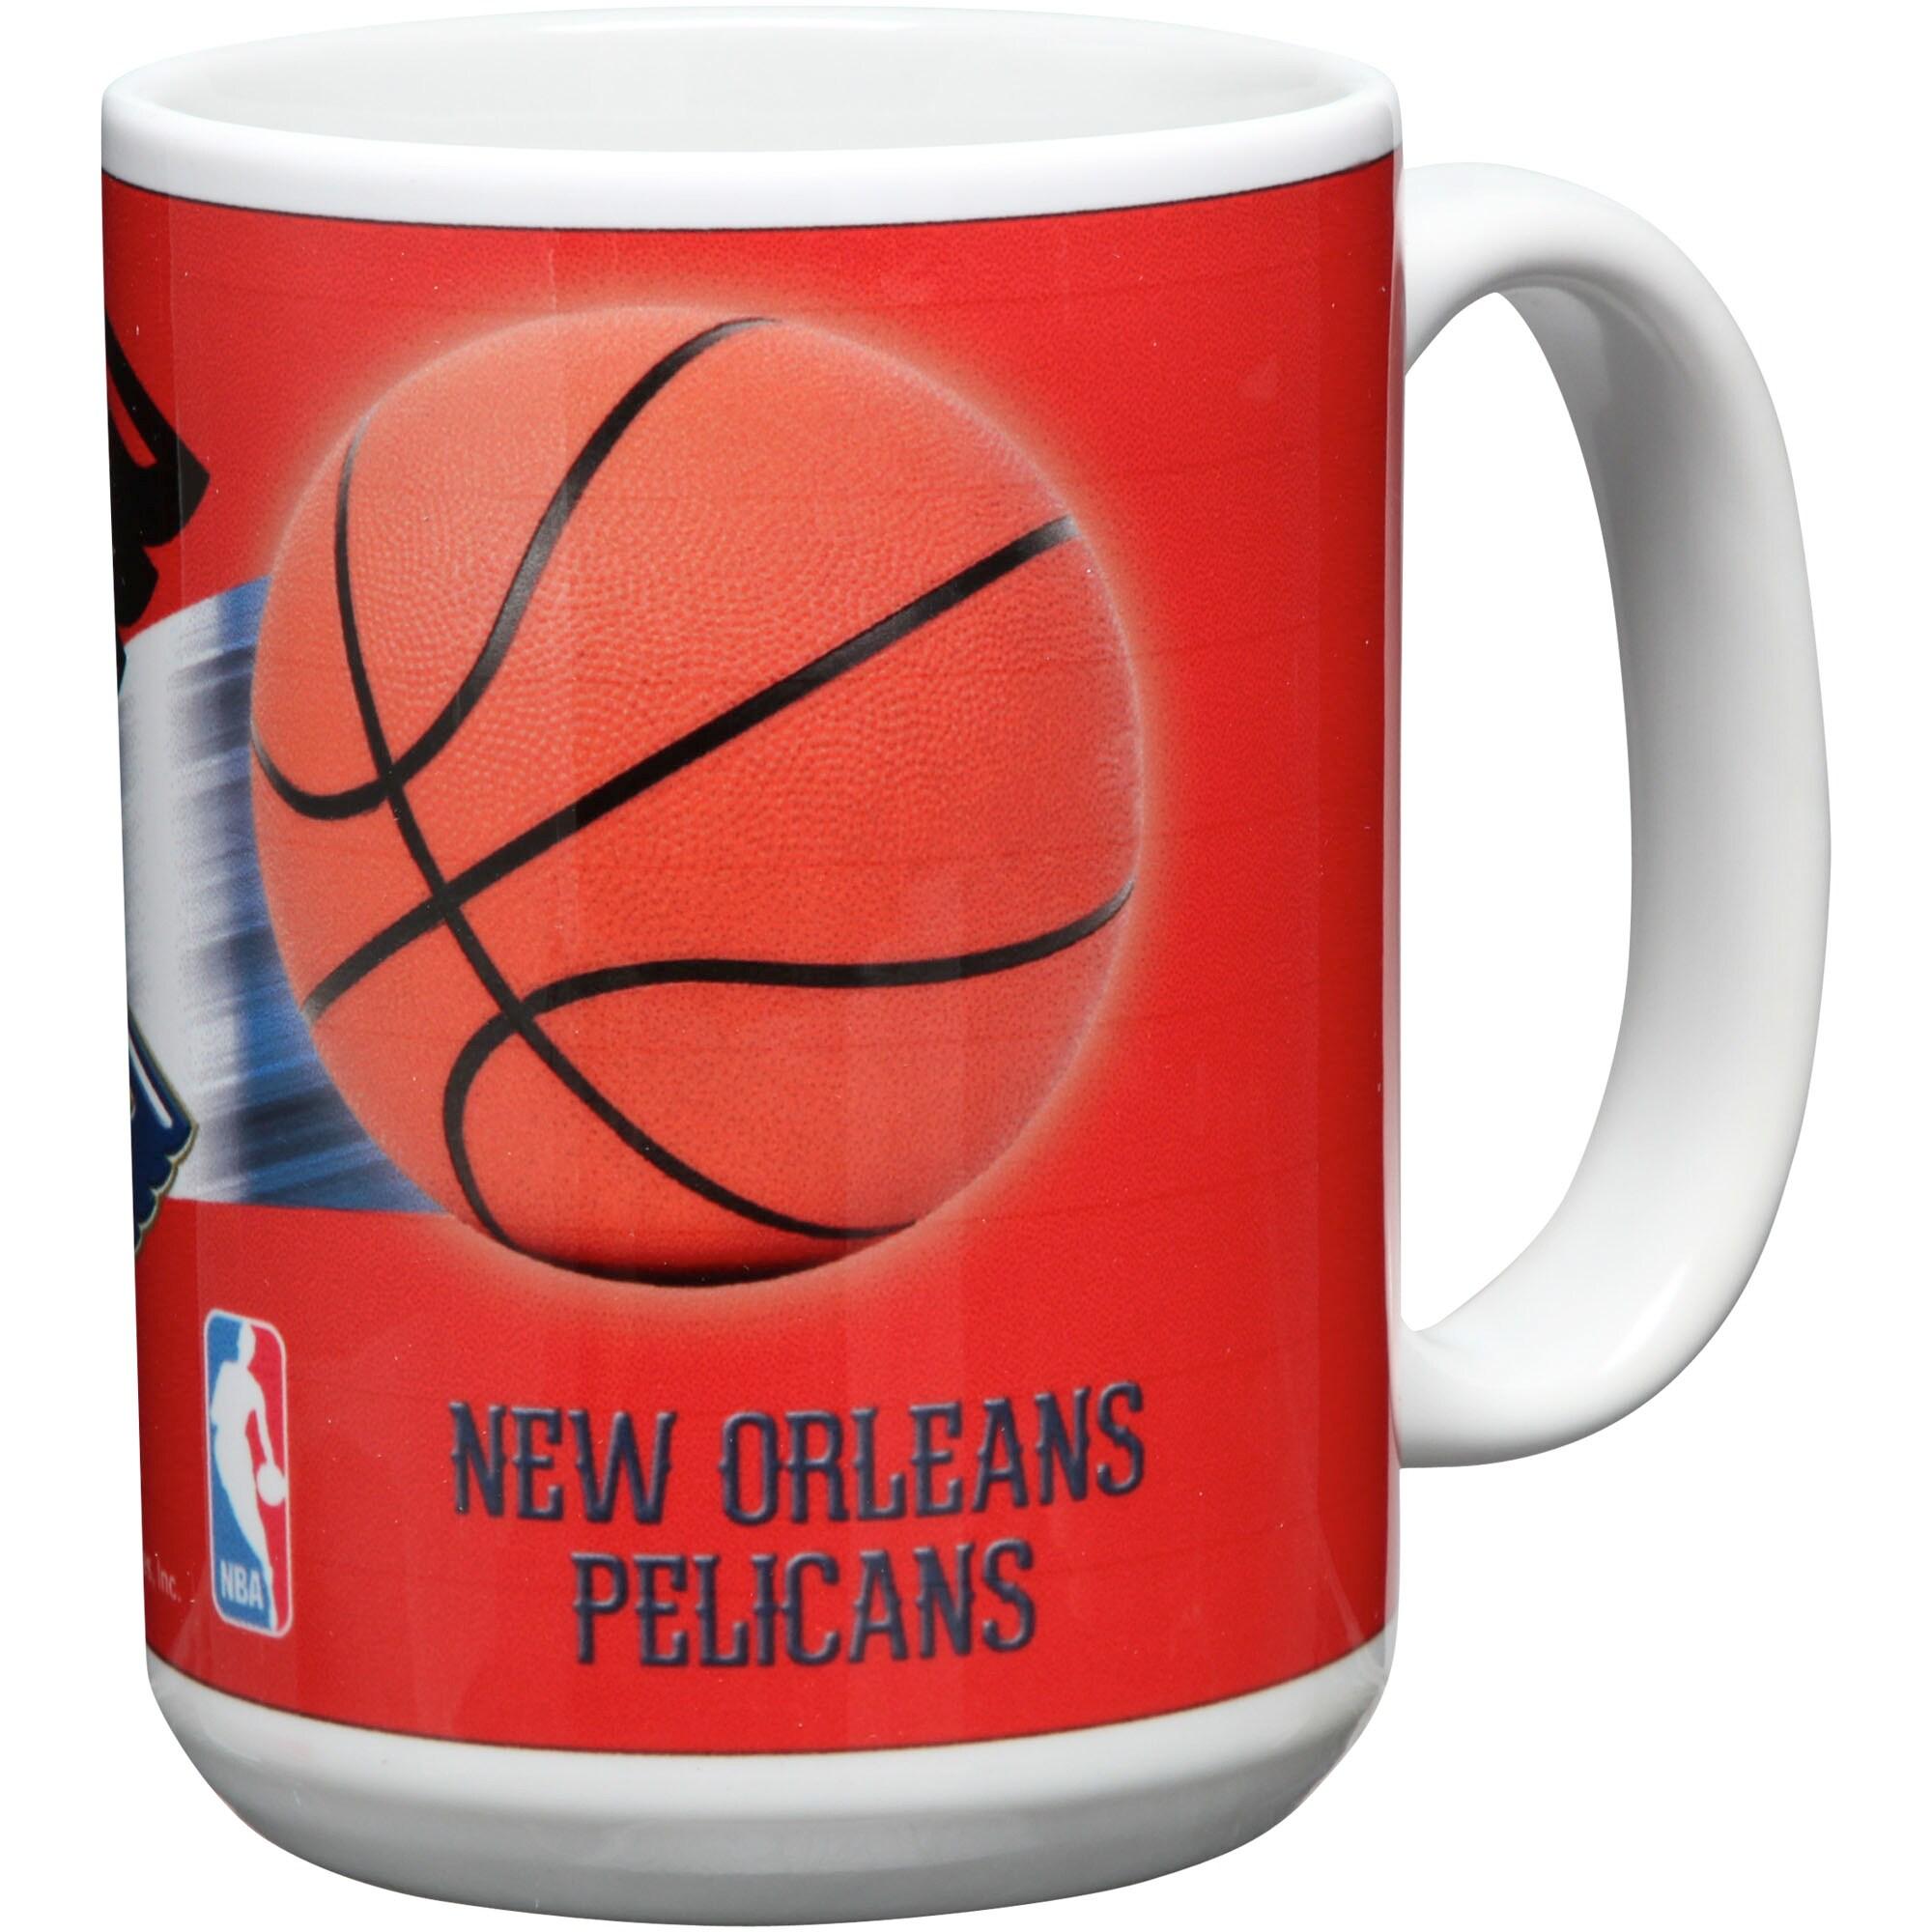 New Orleans Pelicans 15oz. Team 3D Graphic Mug